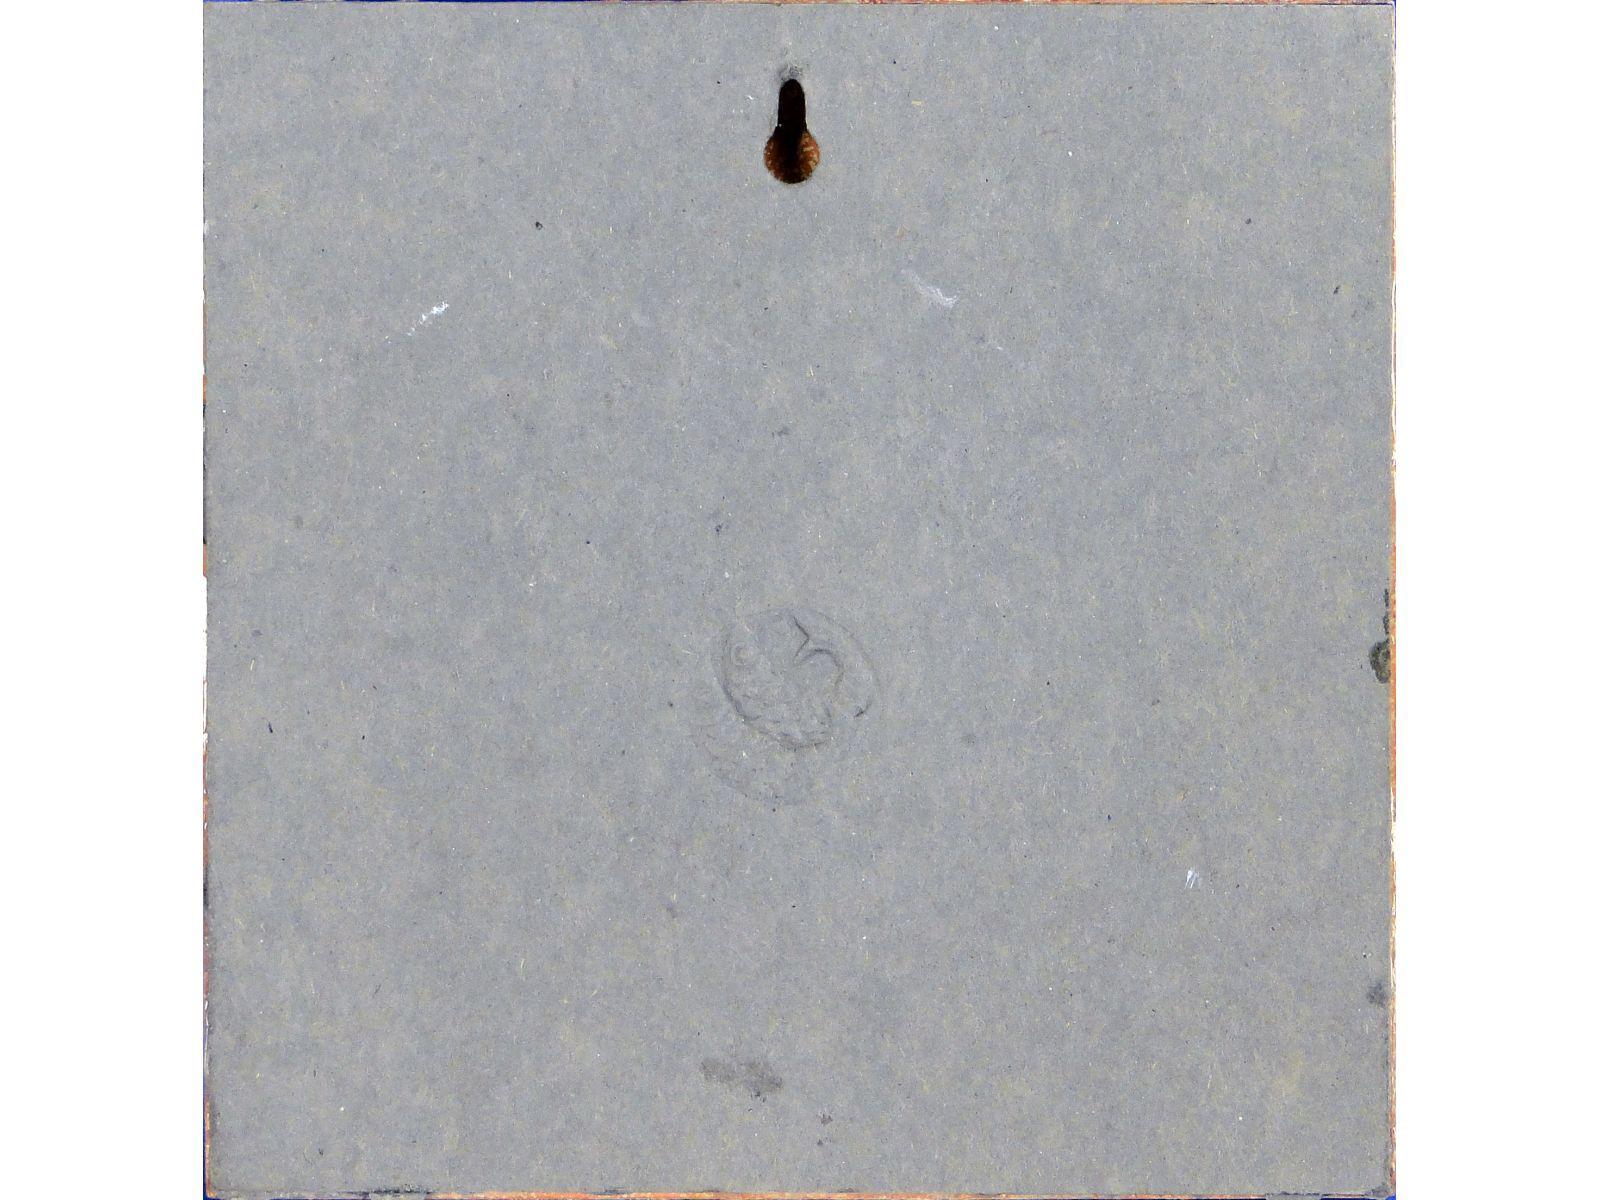 DSC05181.JPG (1600×1200)